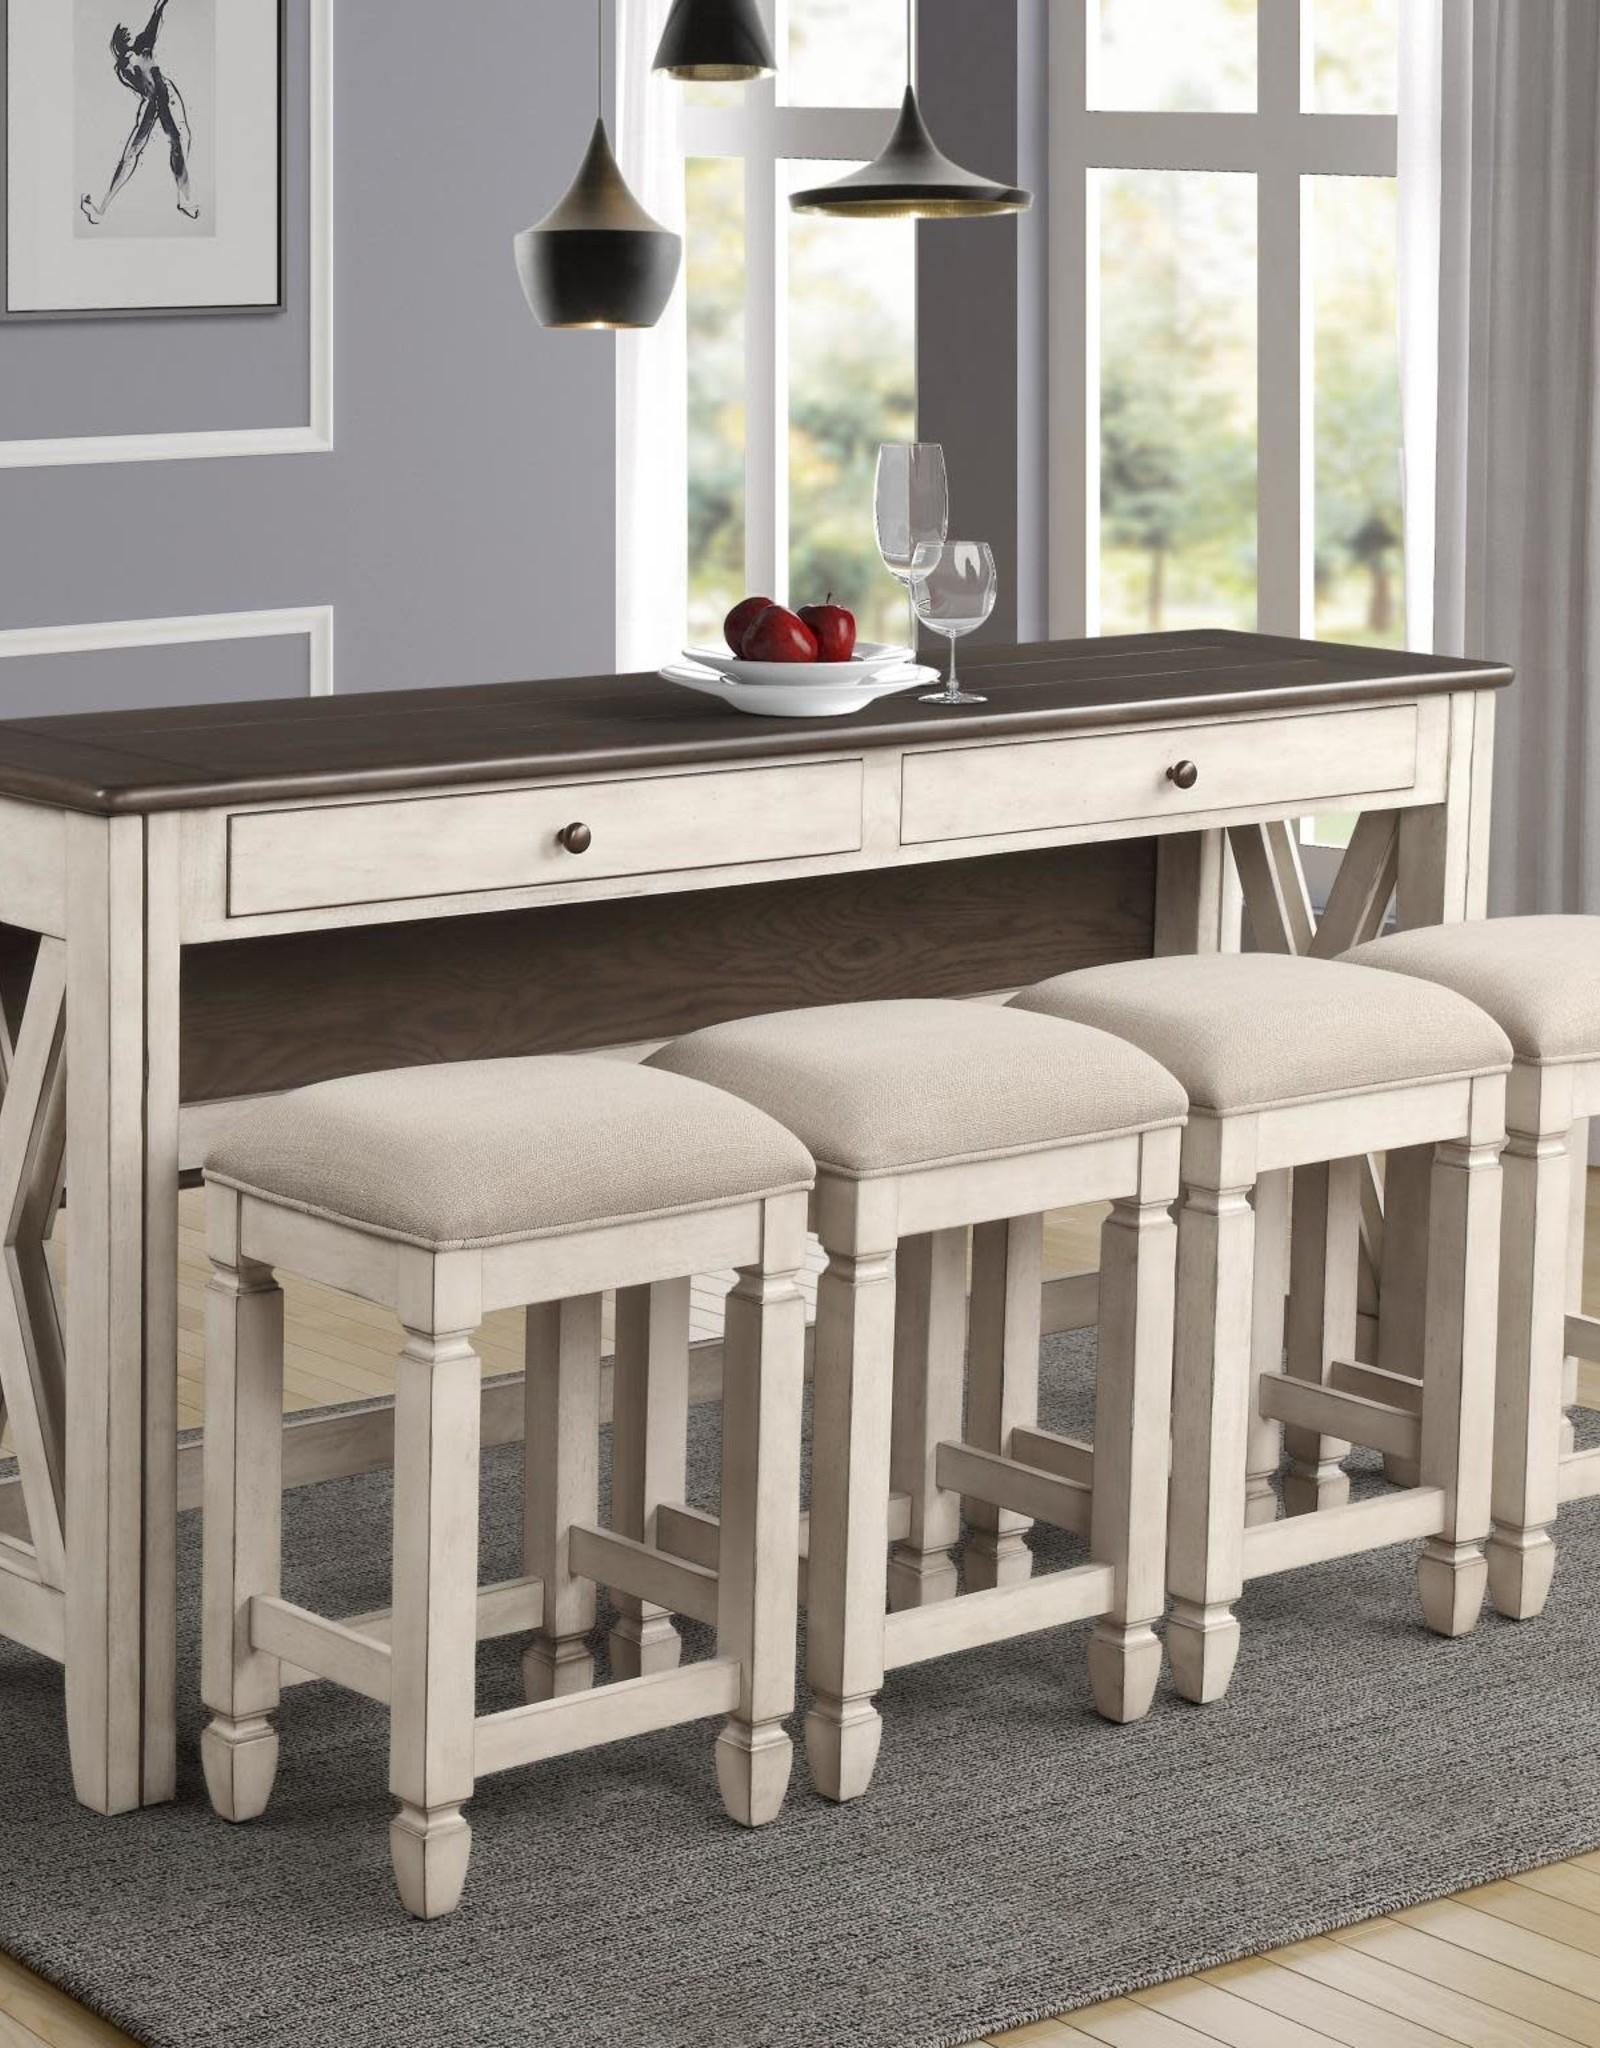 Bernards Waverly 5-Piece Drop-Side Bar Sofa Table w/ Stools - Beach White